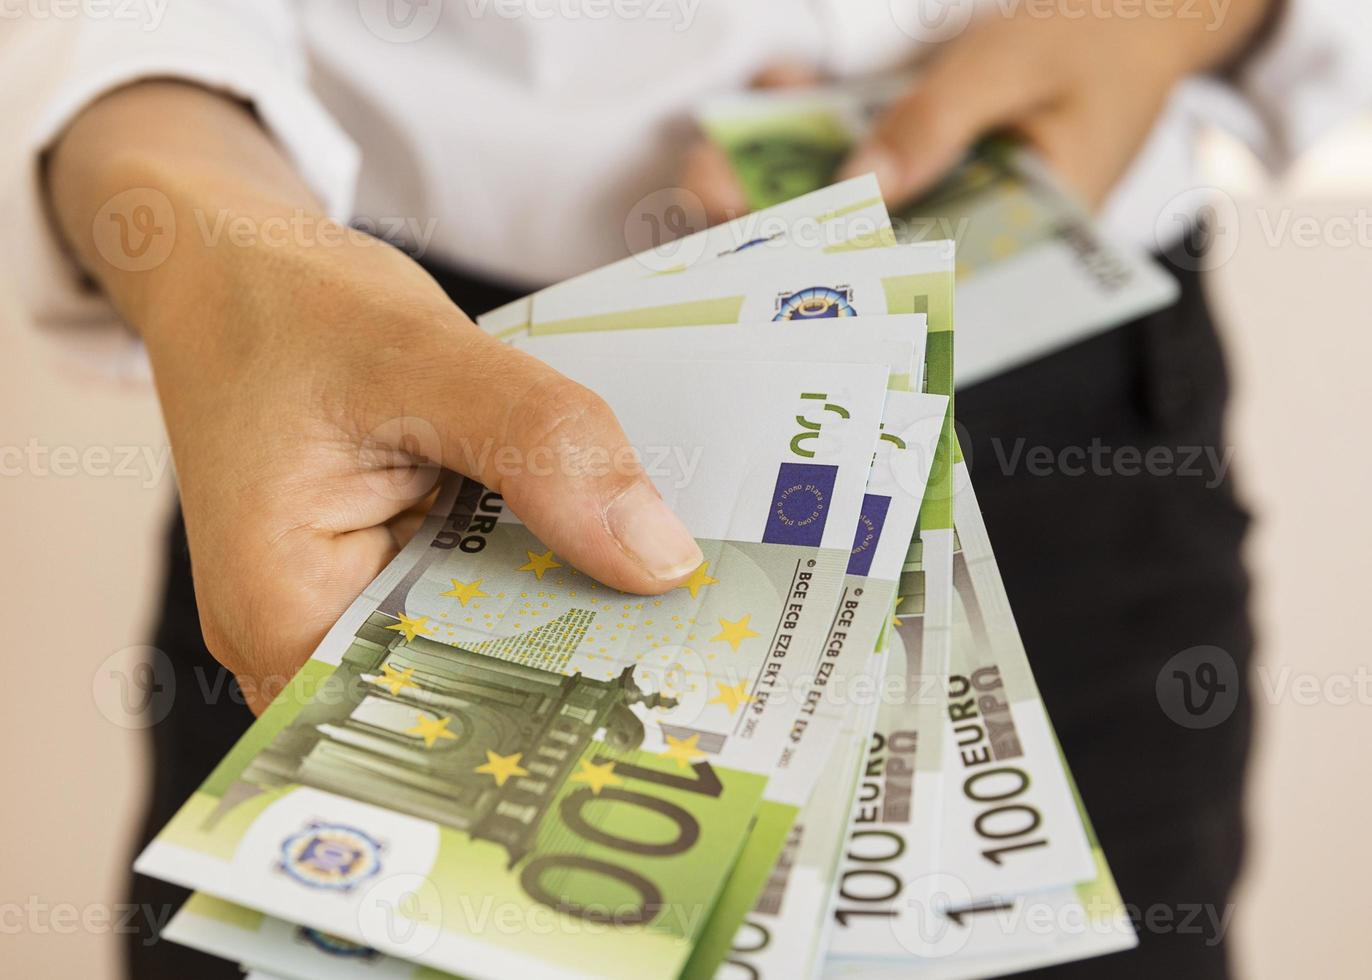 Cash in hand, economic crisis concept photo